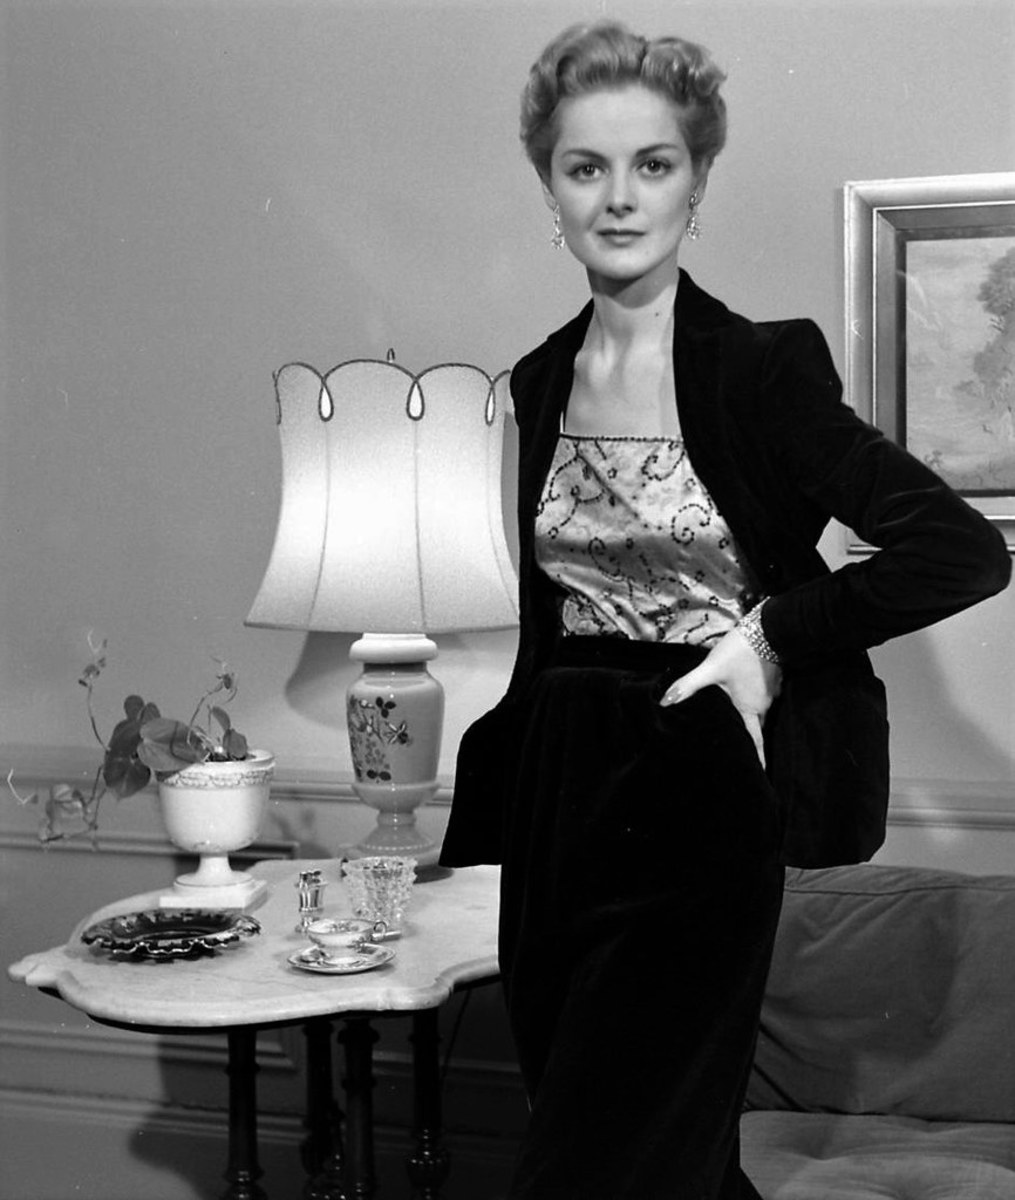 1952 Navy Blazer and Skirt.